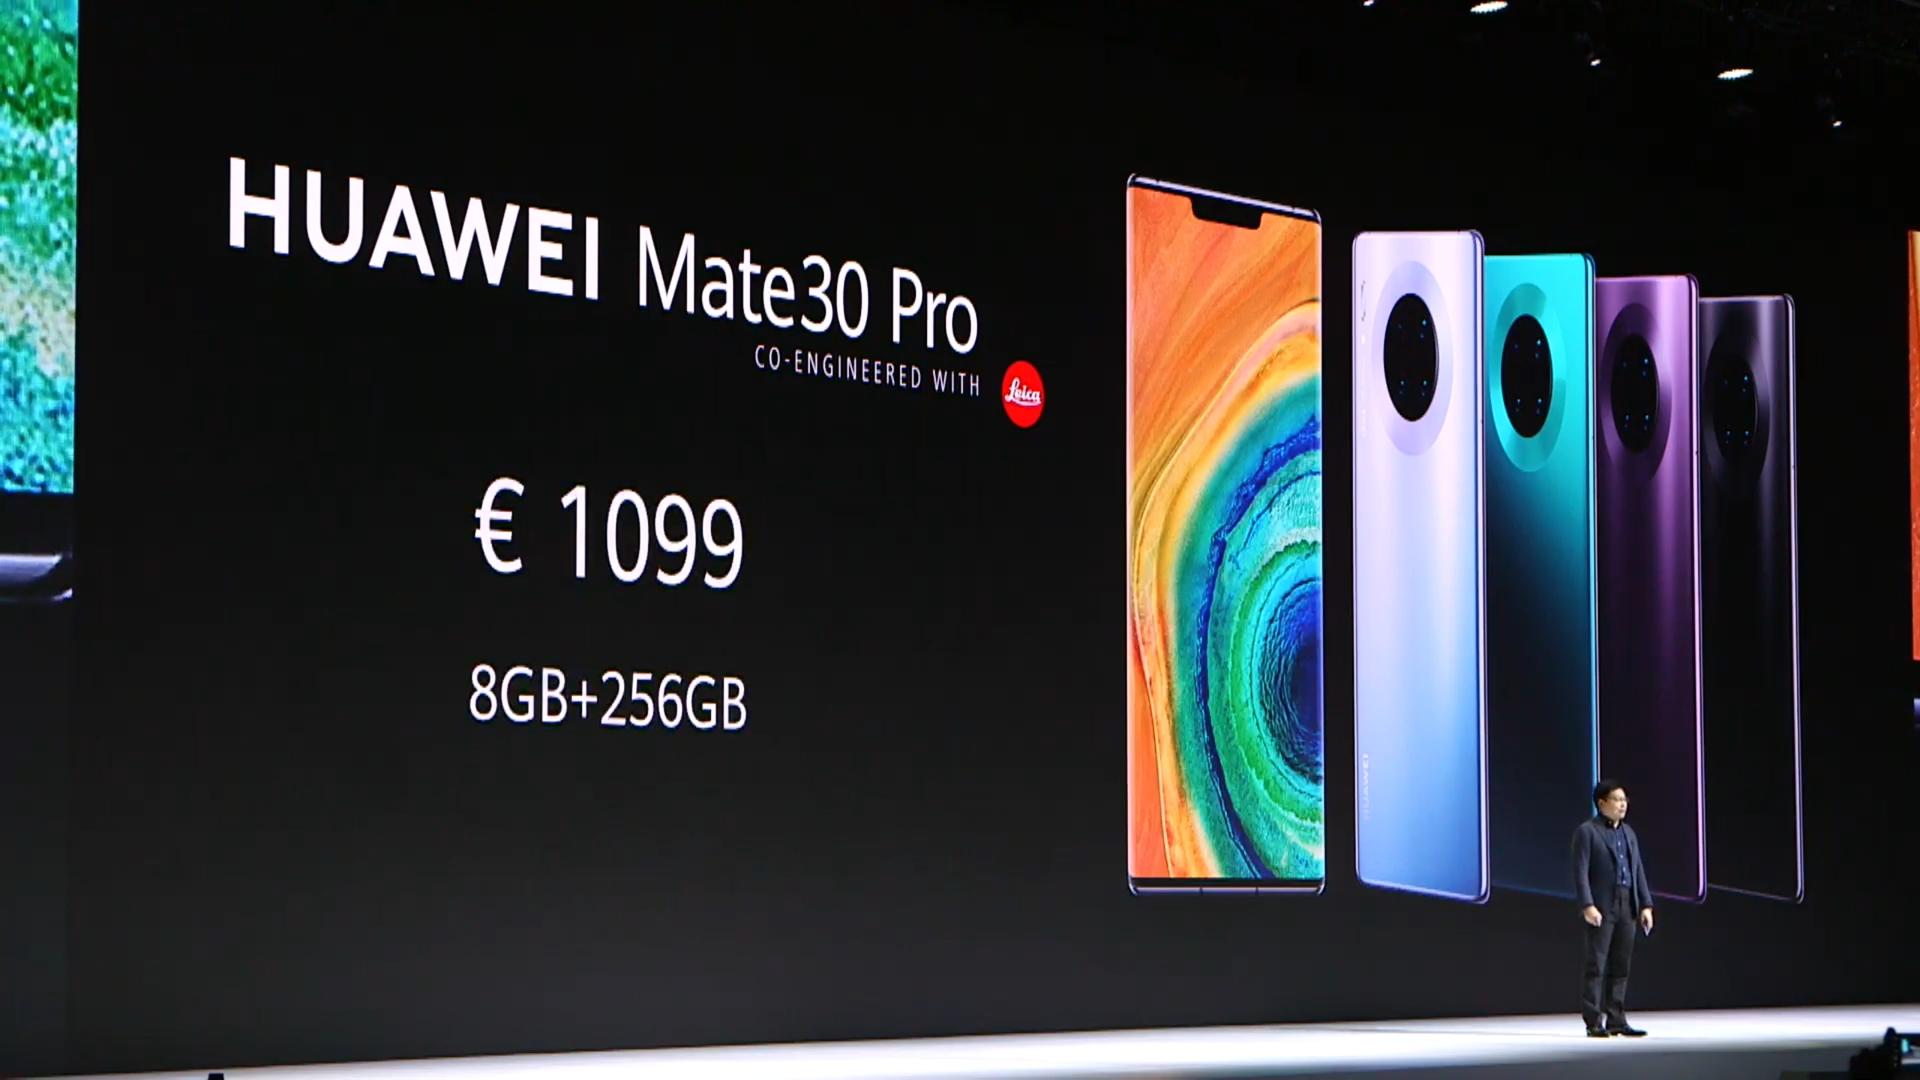 Huawei Mate 30 Pro Price